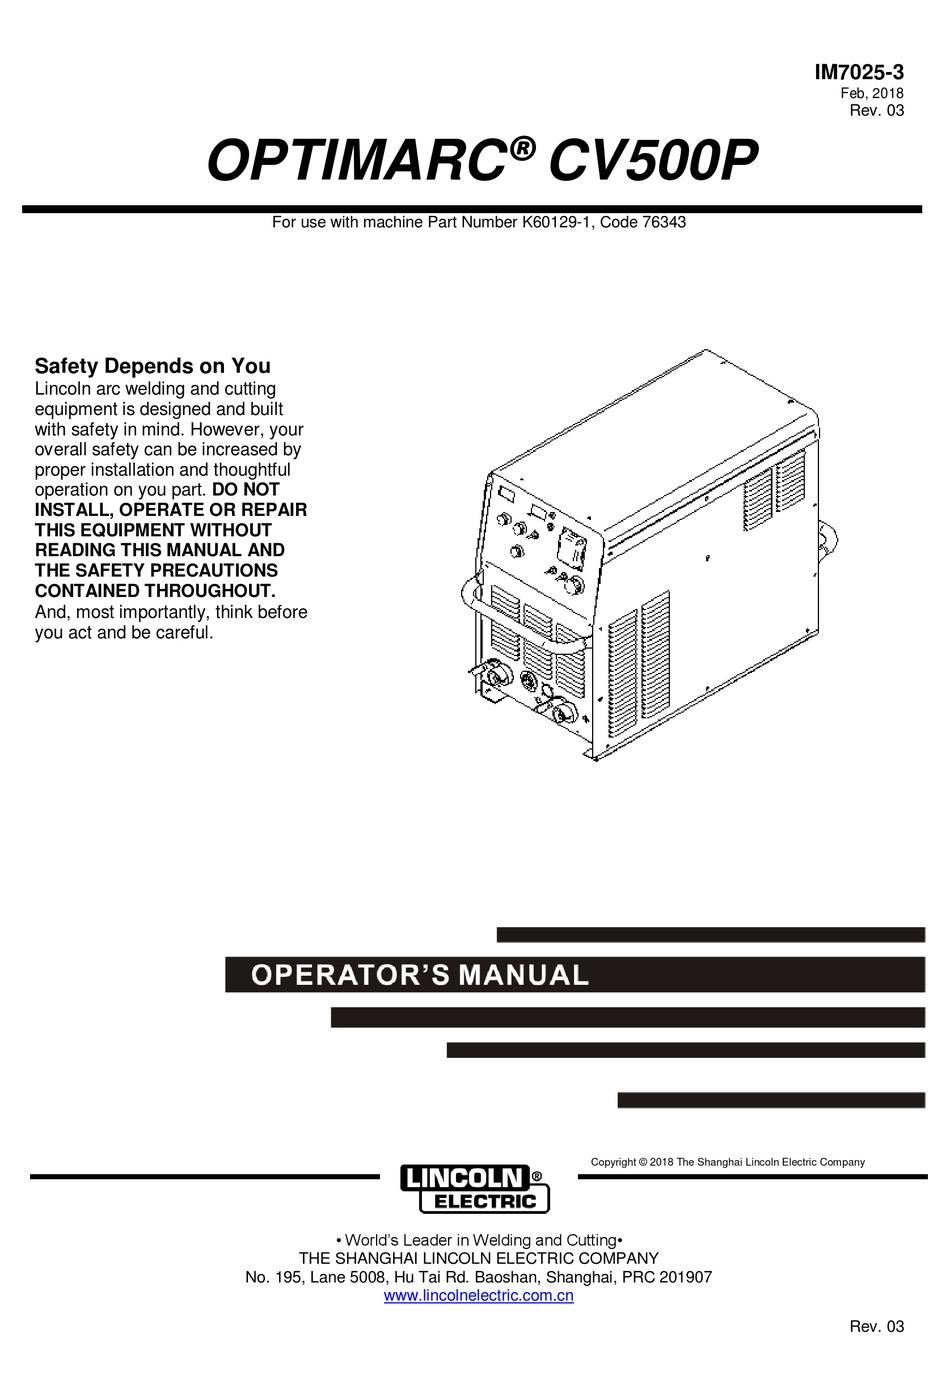 LINCOLN ELECTRIC OPTIMARC CV500P OPERATOR'S MANUAL Pdf